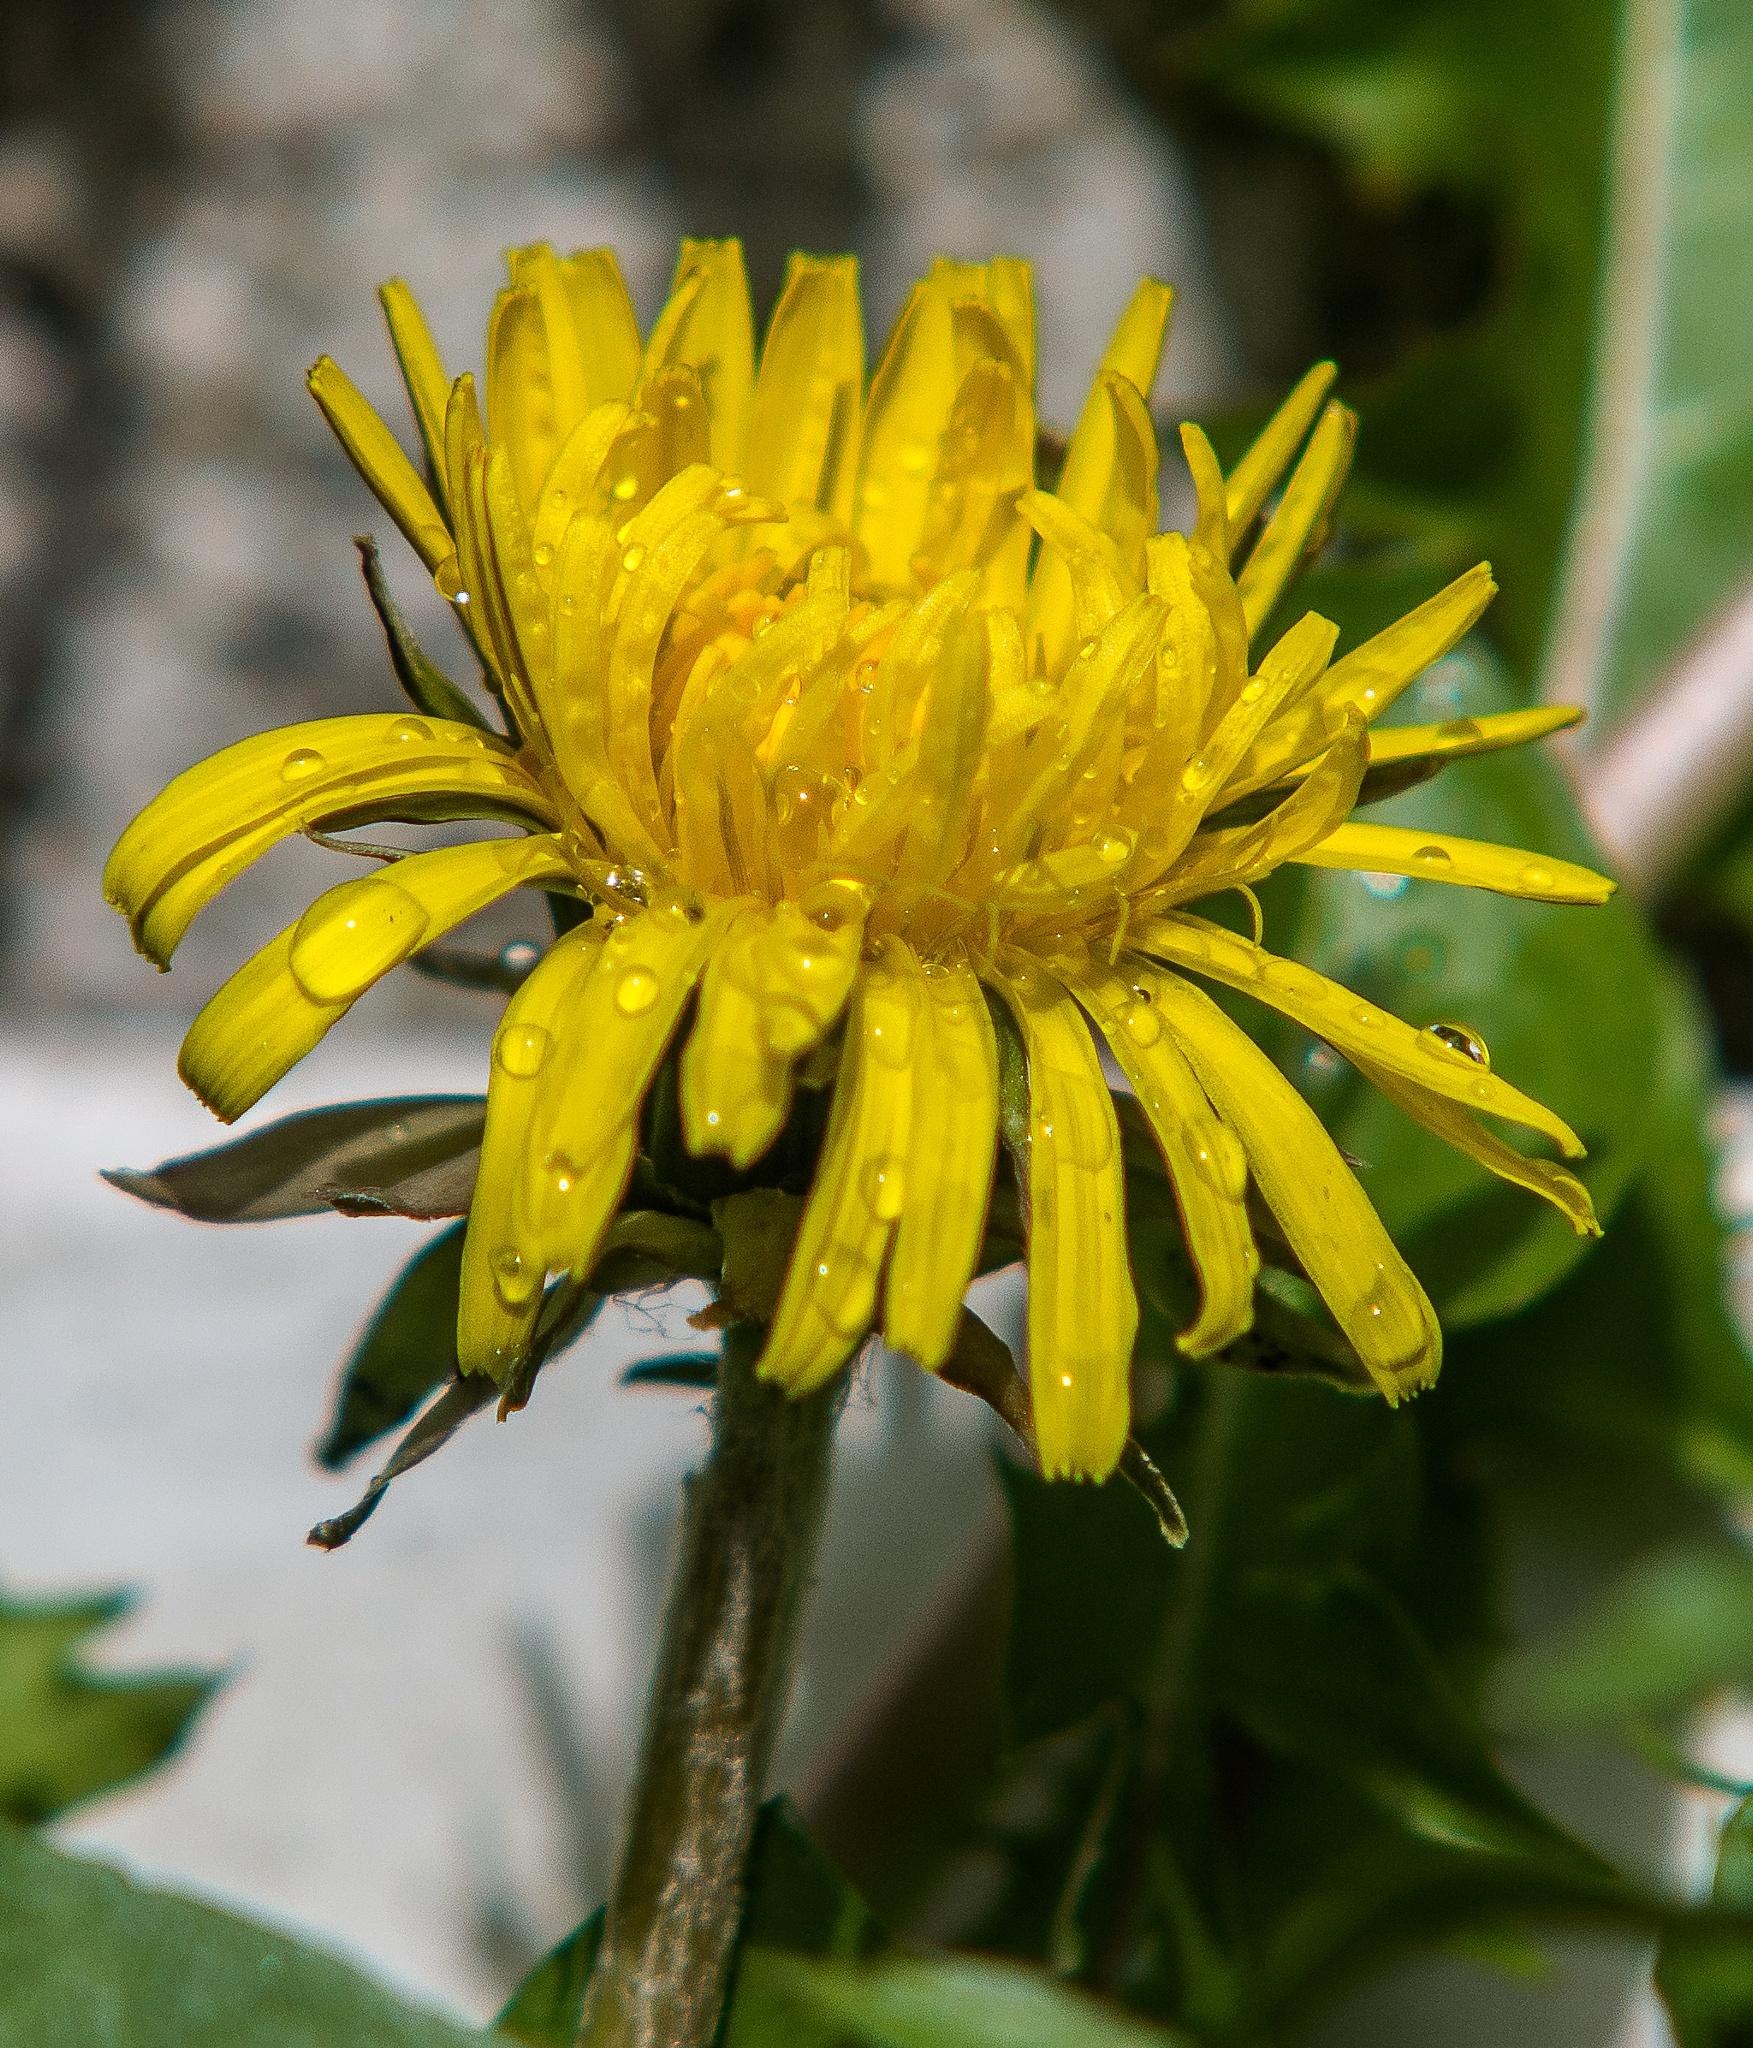 dandelion in the rain by mohhus1